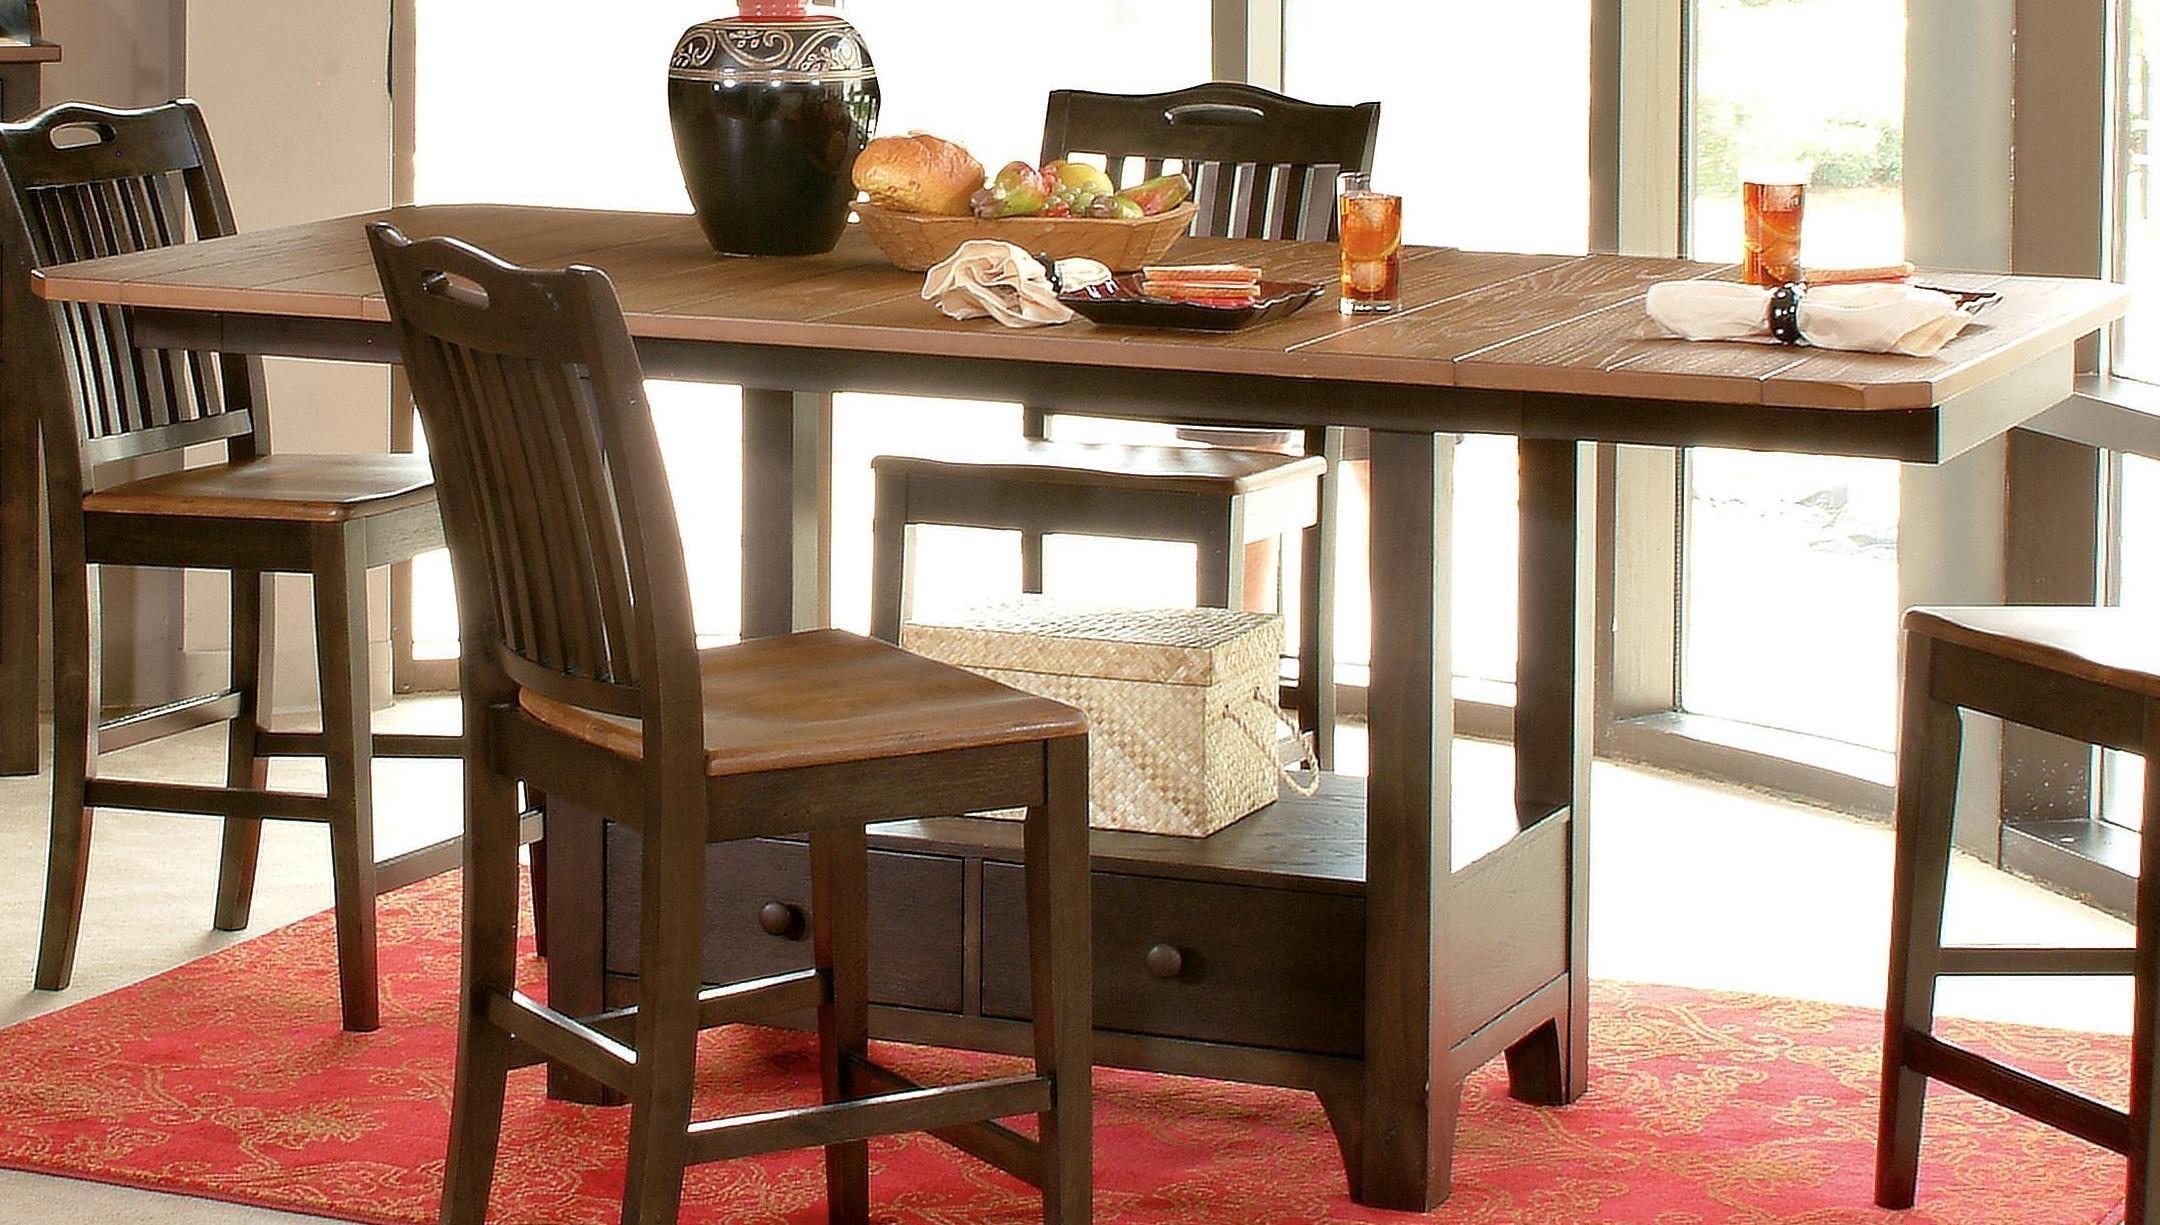 Morris Home Furnishings Grafton Grafton Dining Counter Table Top & Base - Item Number: 130-484T/B